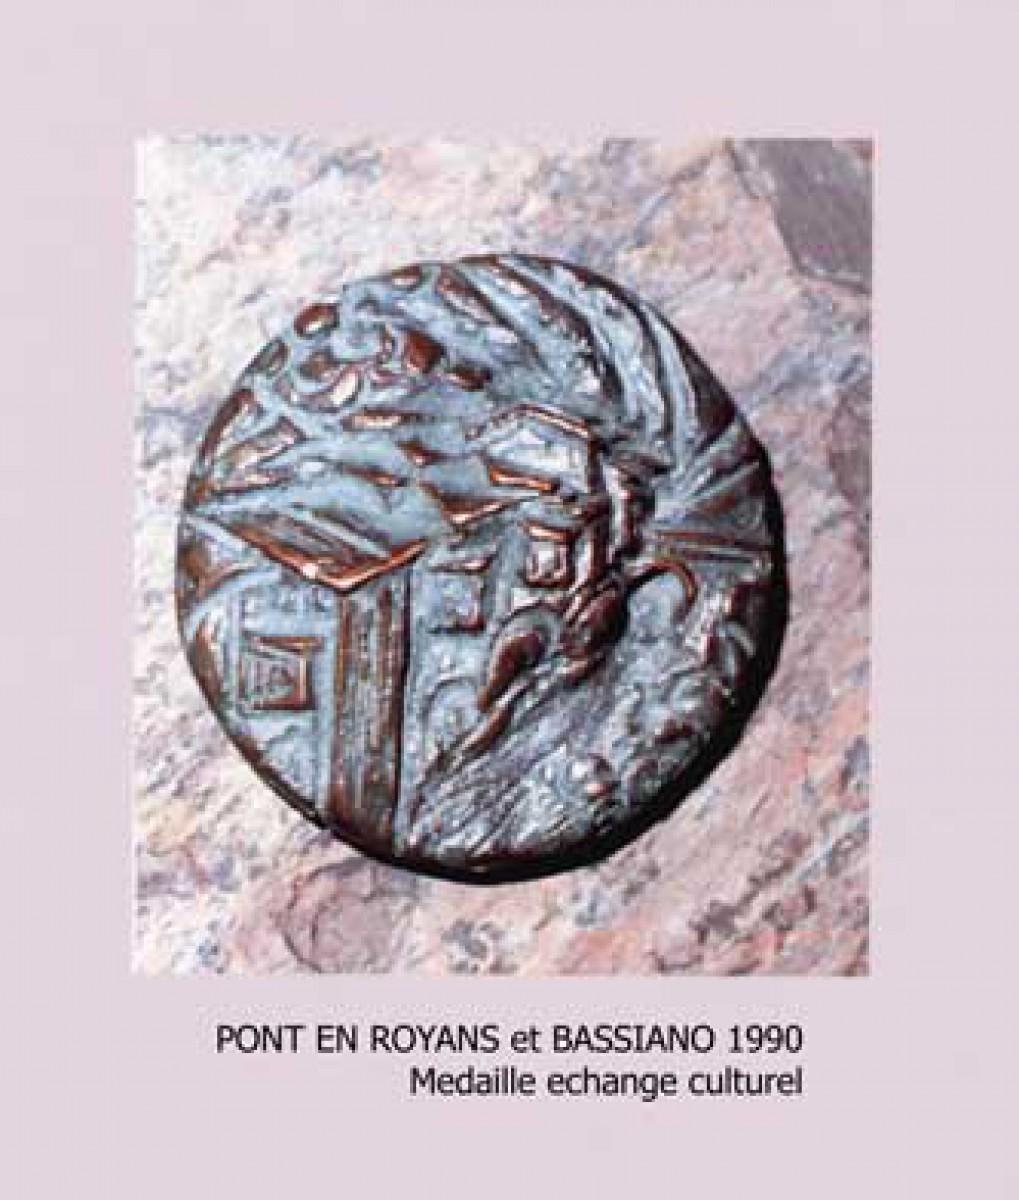 Medal (relief for the city of Pont en Royans)